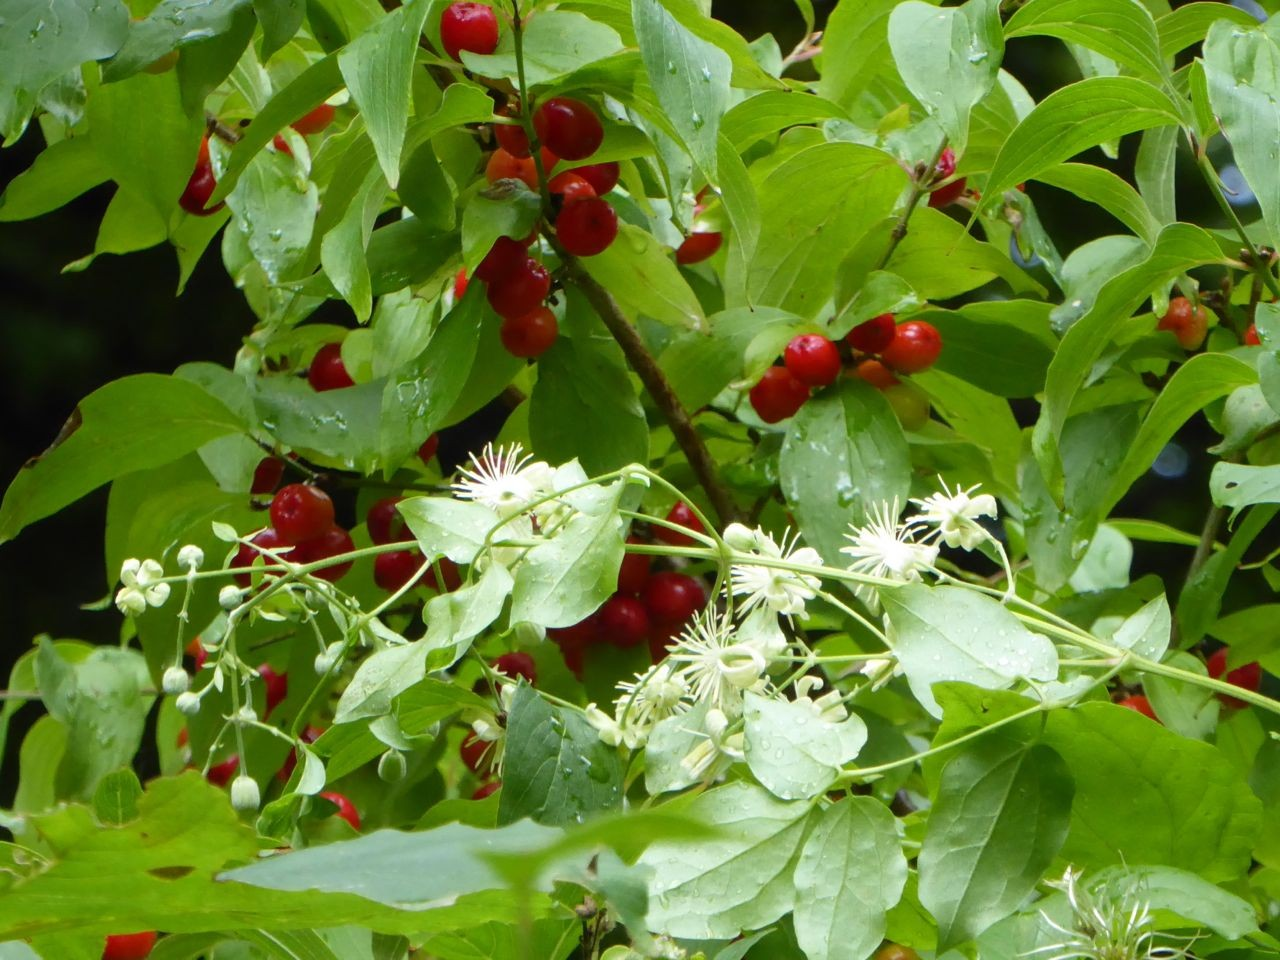 Haithabu Früchte